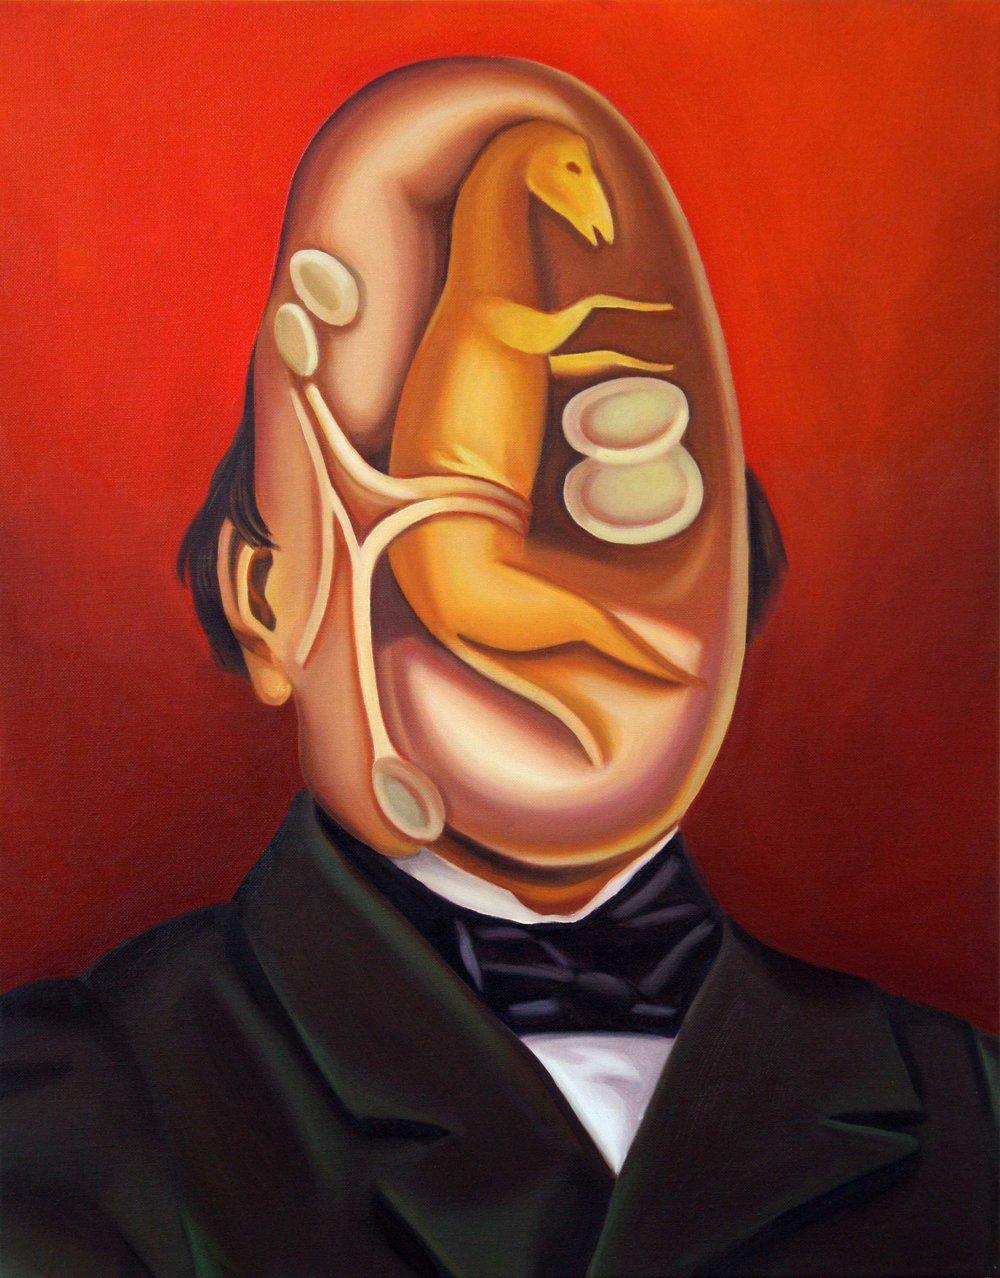 Horse Foetus Man , 2014. Oil on canvas, 70 x 55 cm.